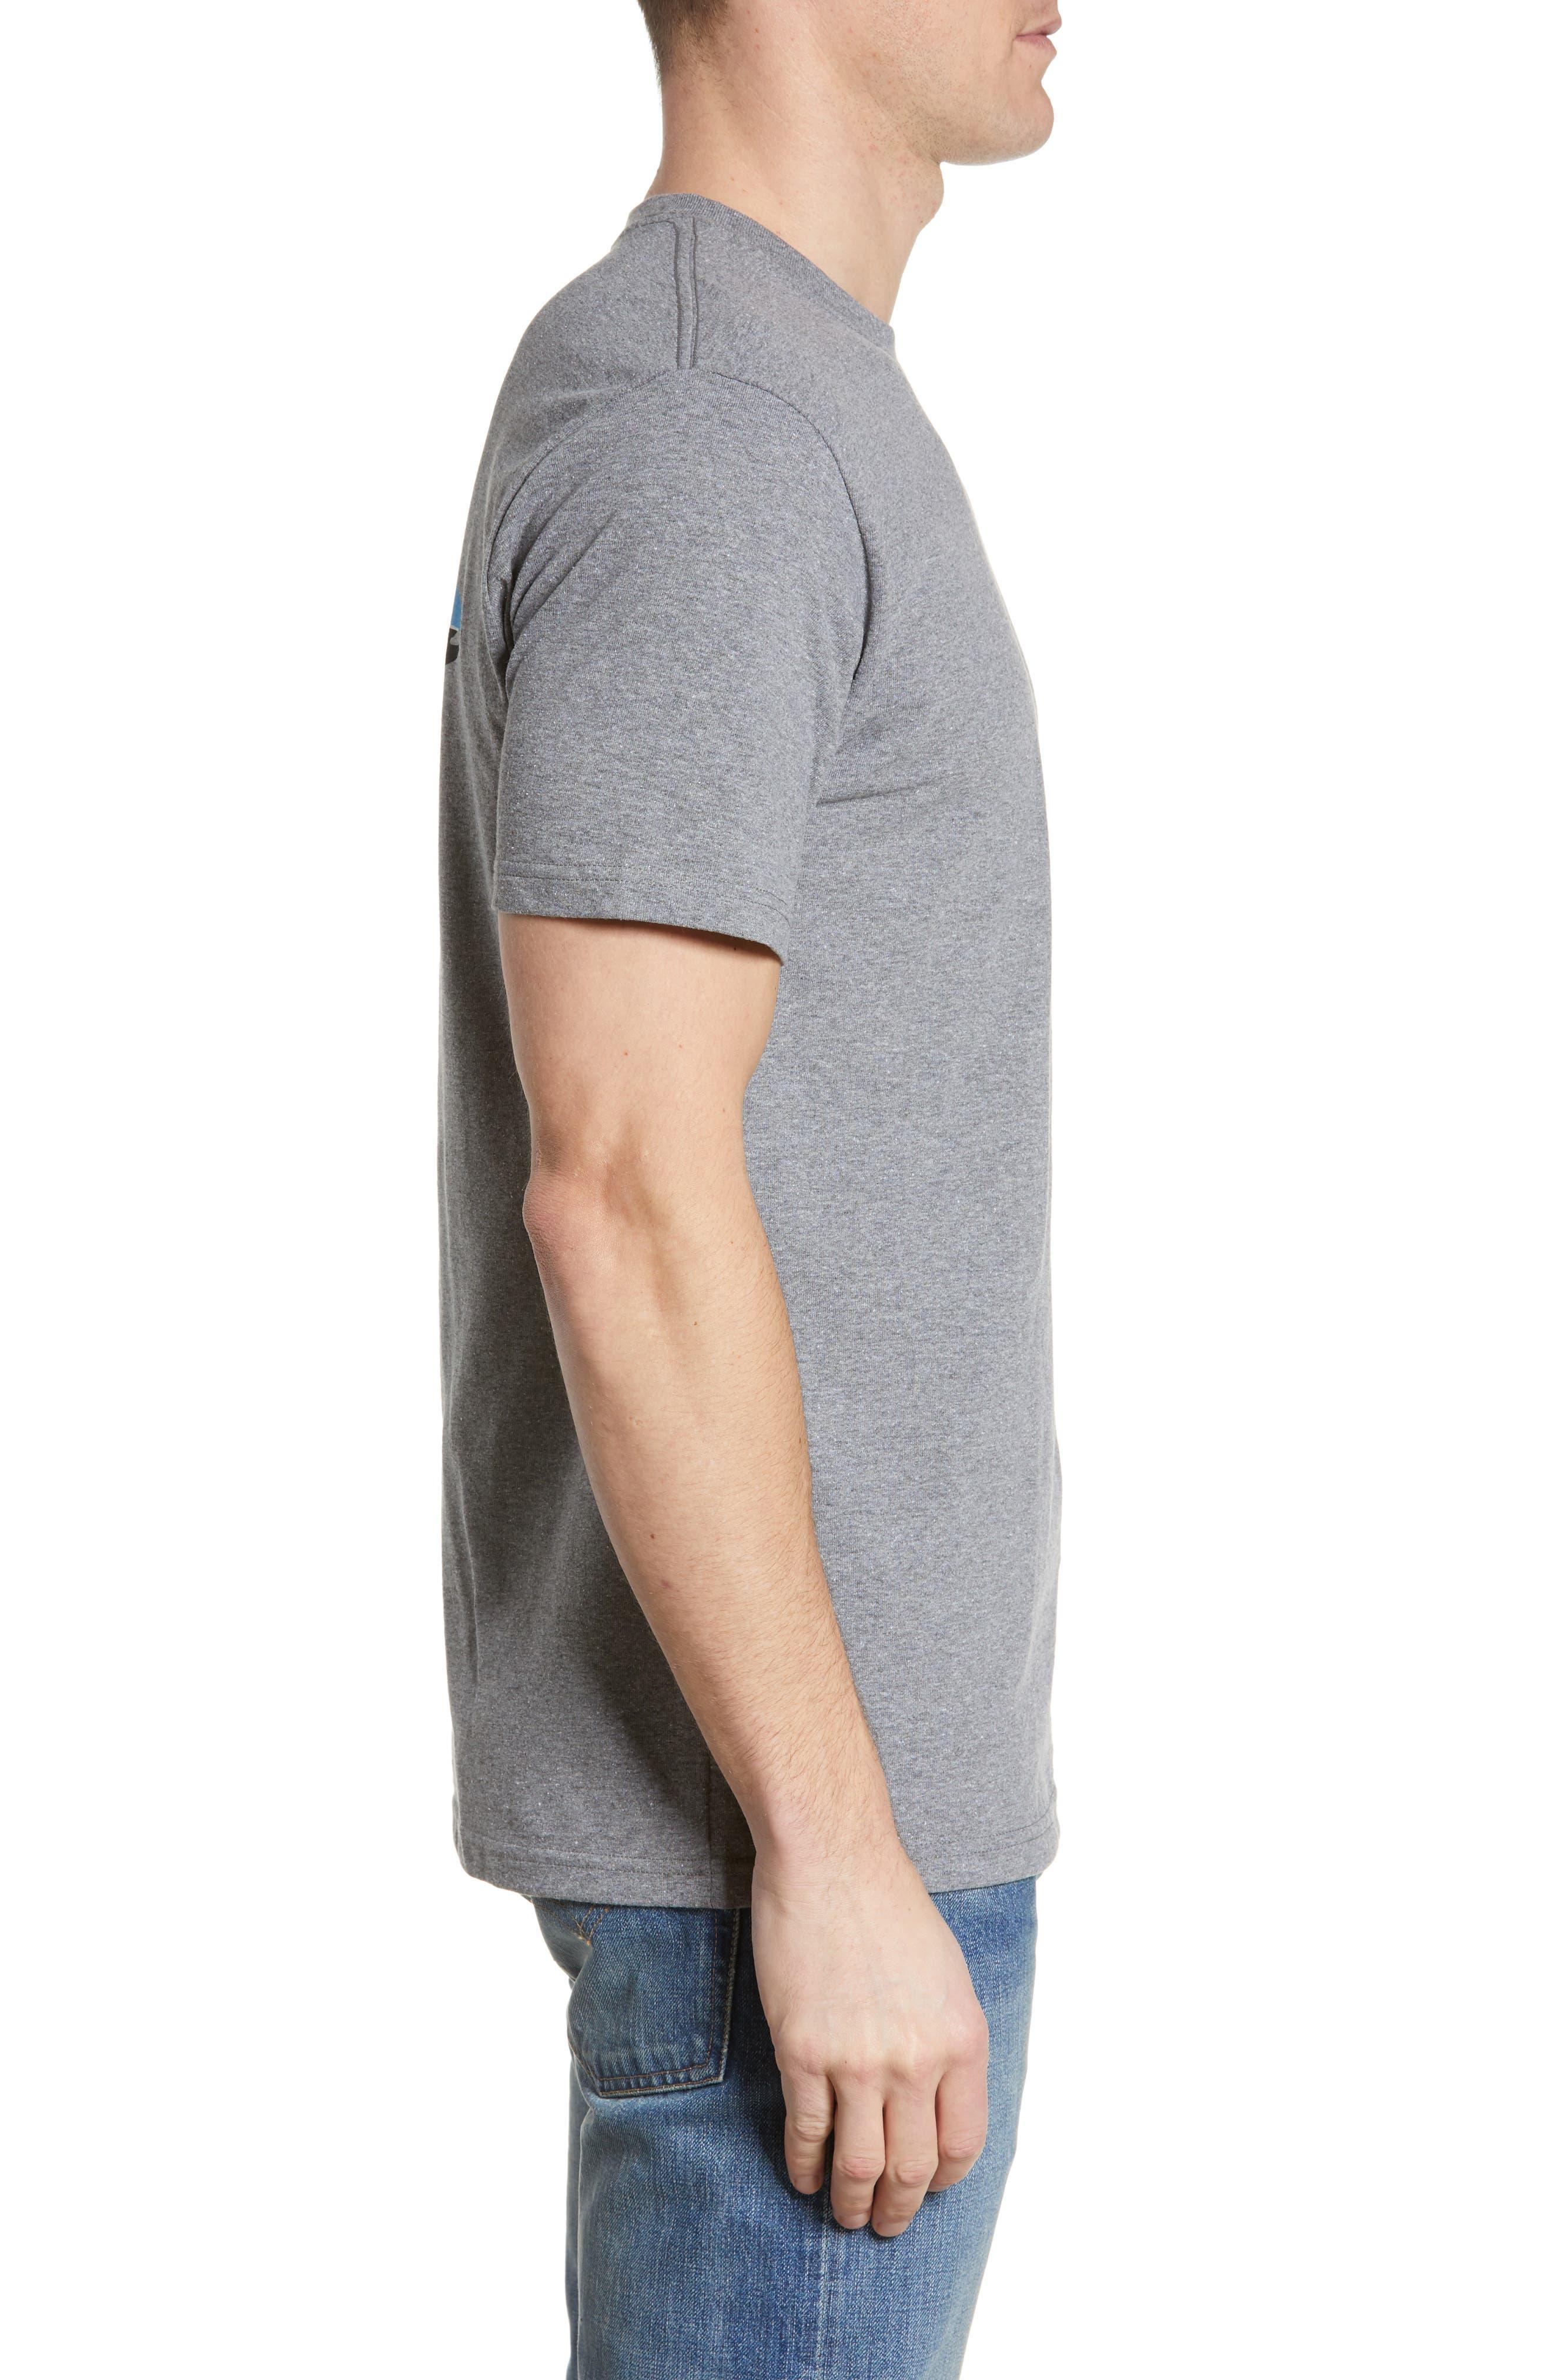 PATAGONIA,                             Fitz Roy Trout Crewneck T-Shirt,                             Alternate thumbnail 3, color,                             GRAVEL HEATHER